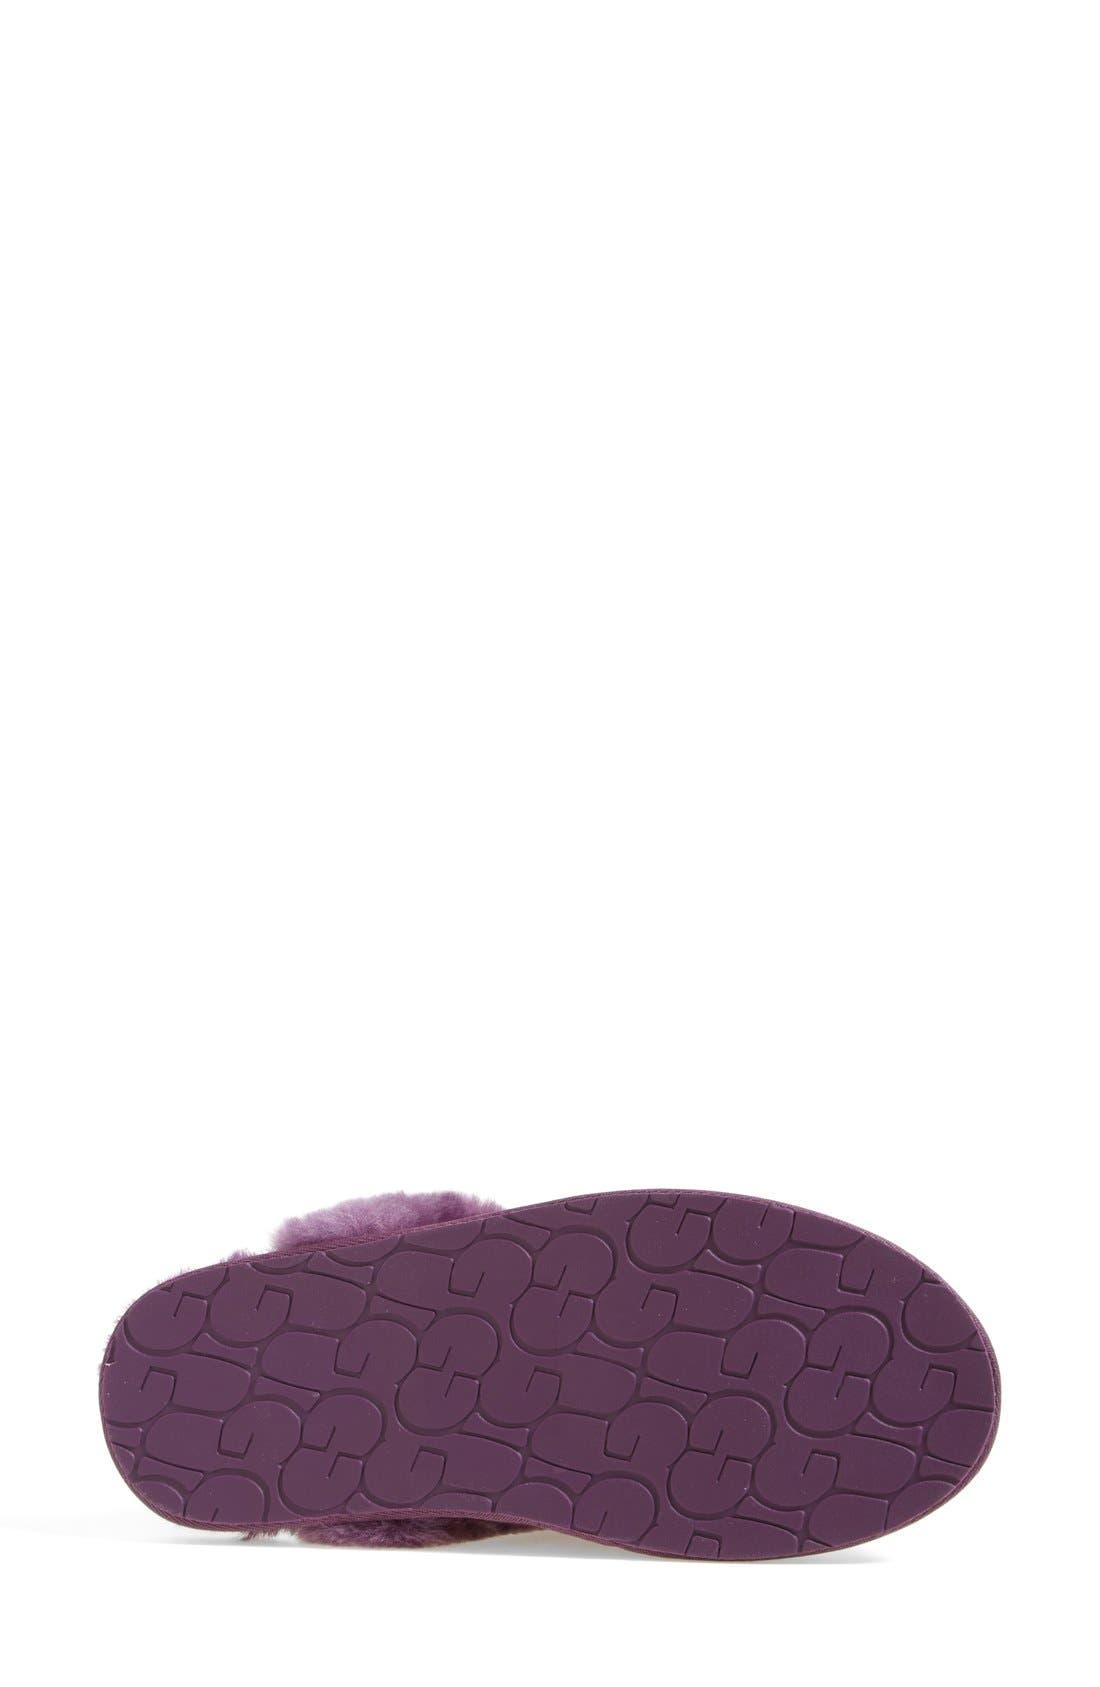 Australia Scuffette II - Exotic Genuine Calf Hair Slipper,                             Alternate thumbnail 9, color,